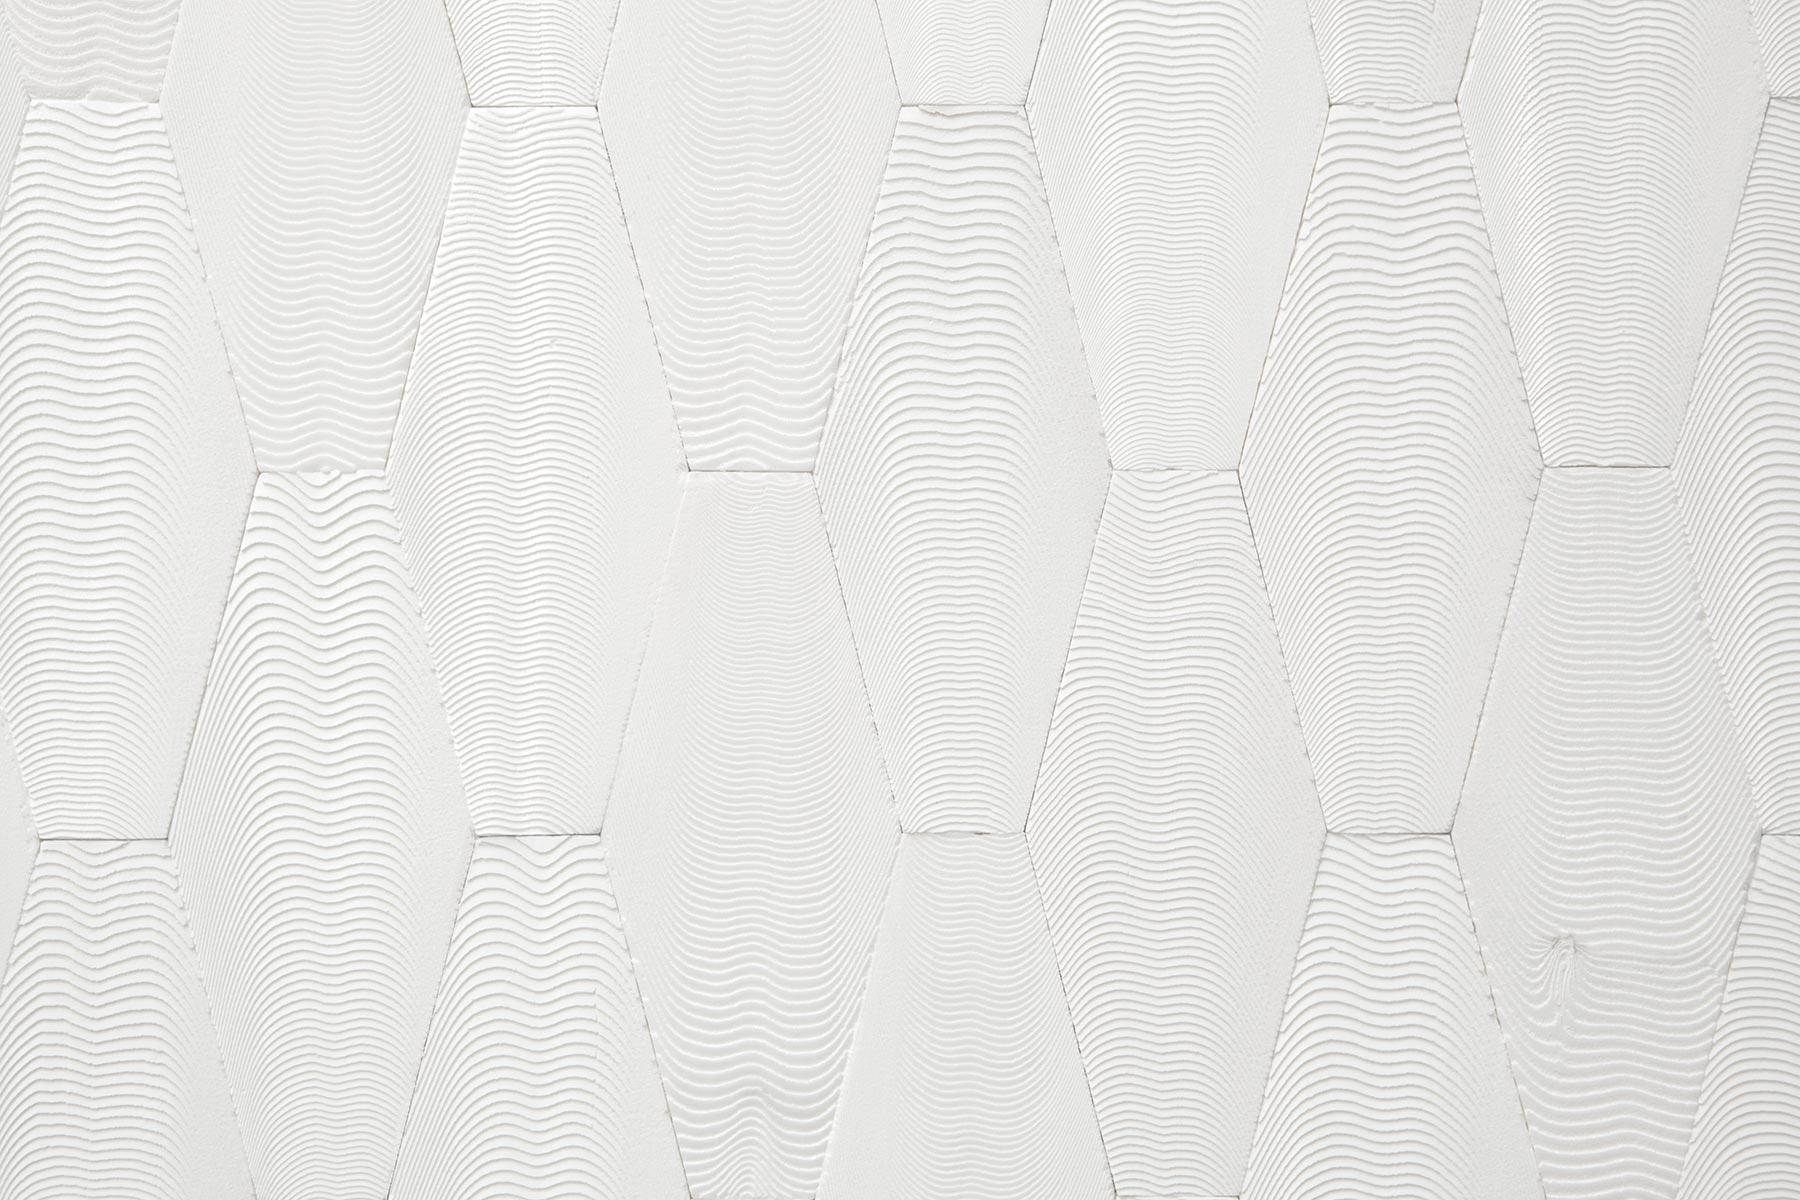 Alastair Mackie|Complex System 178 & 179|2015|cuttlebone|cuttlefish|geometry|veneer|sculpture